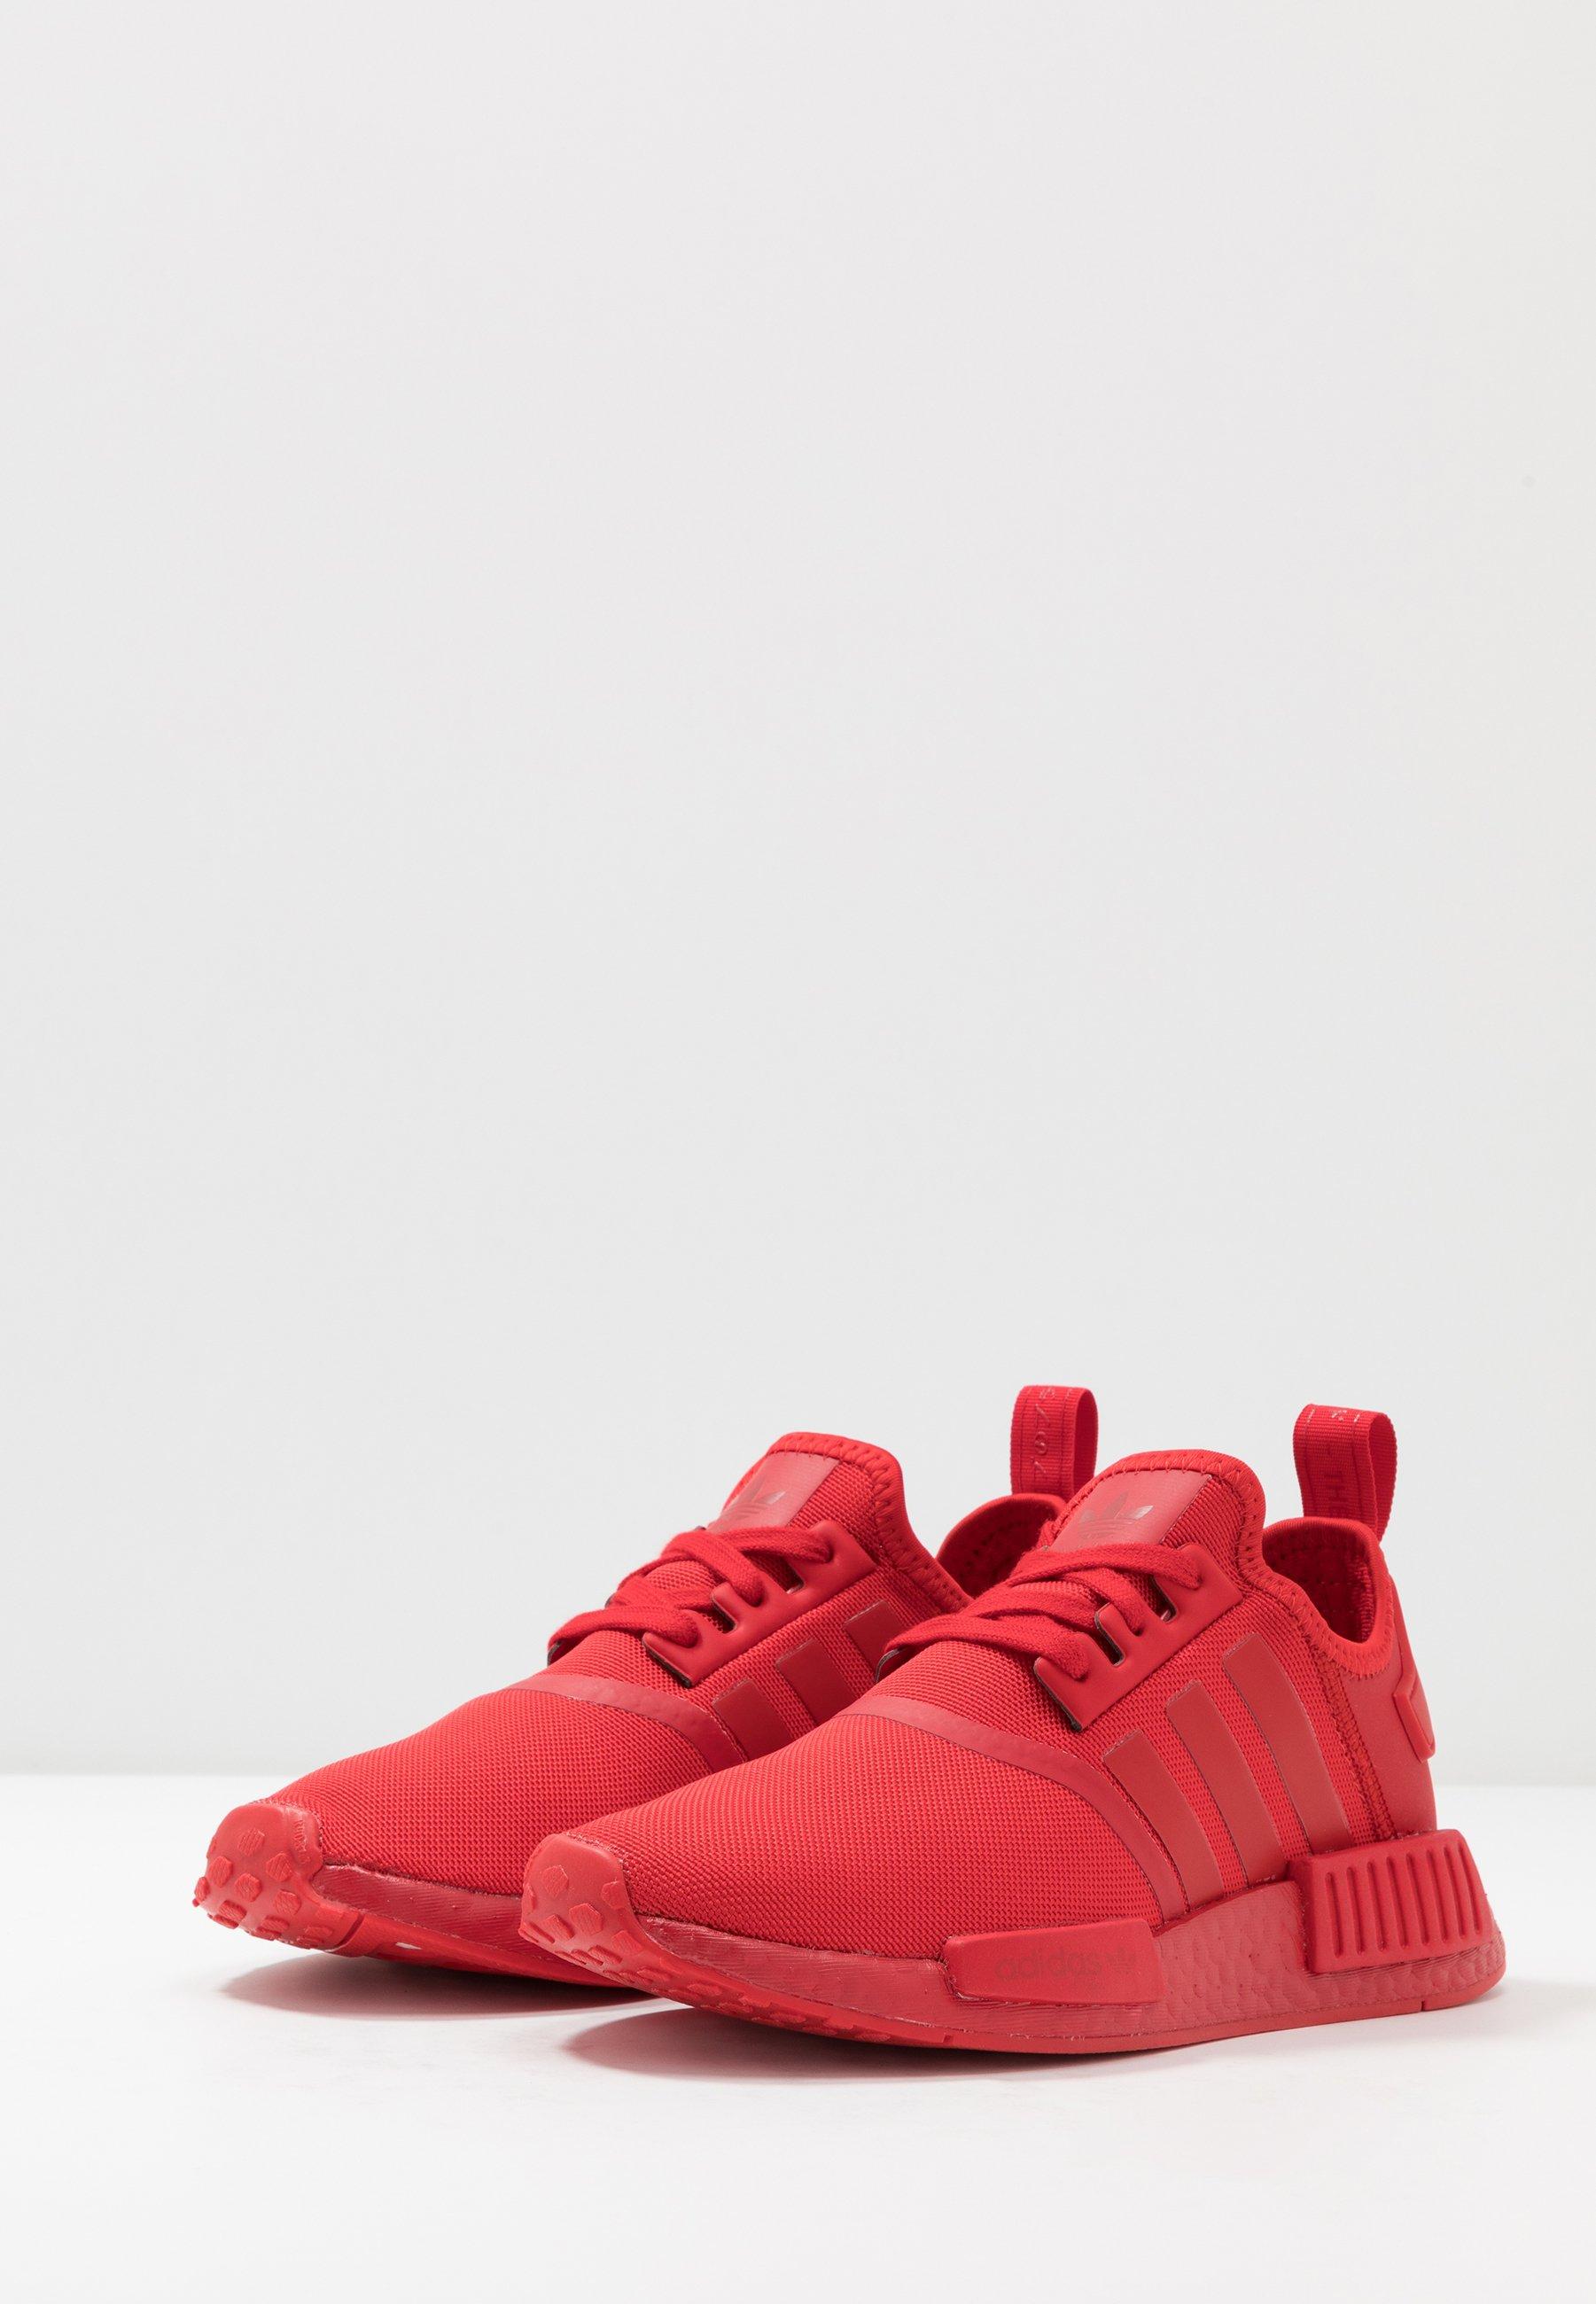 Adidas Originals Nmd R1 - Baskets Basses Scarlet 6rPTwKa